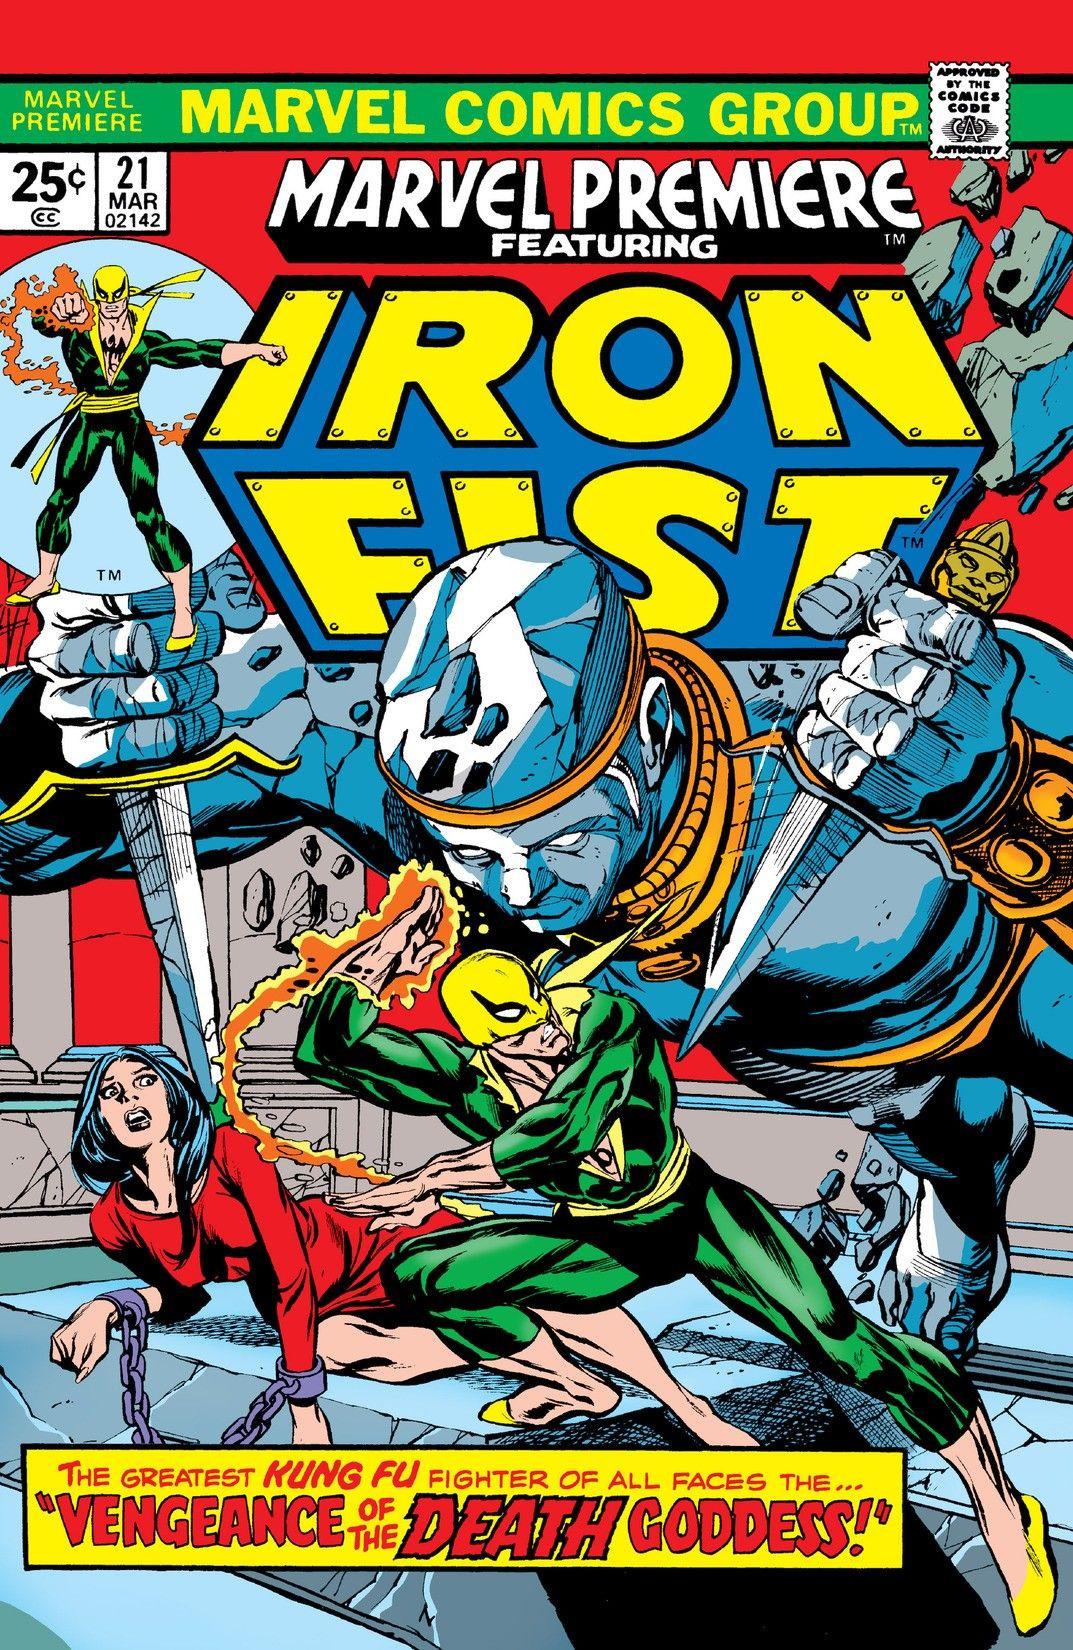 Marvel Premiere Vol 1 21